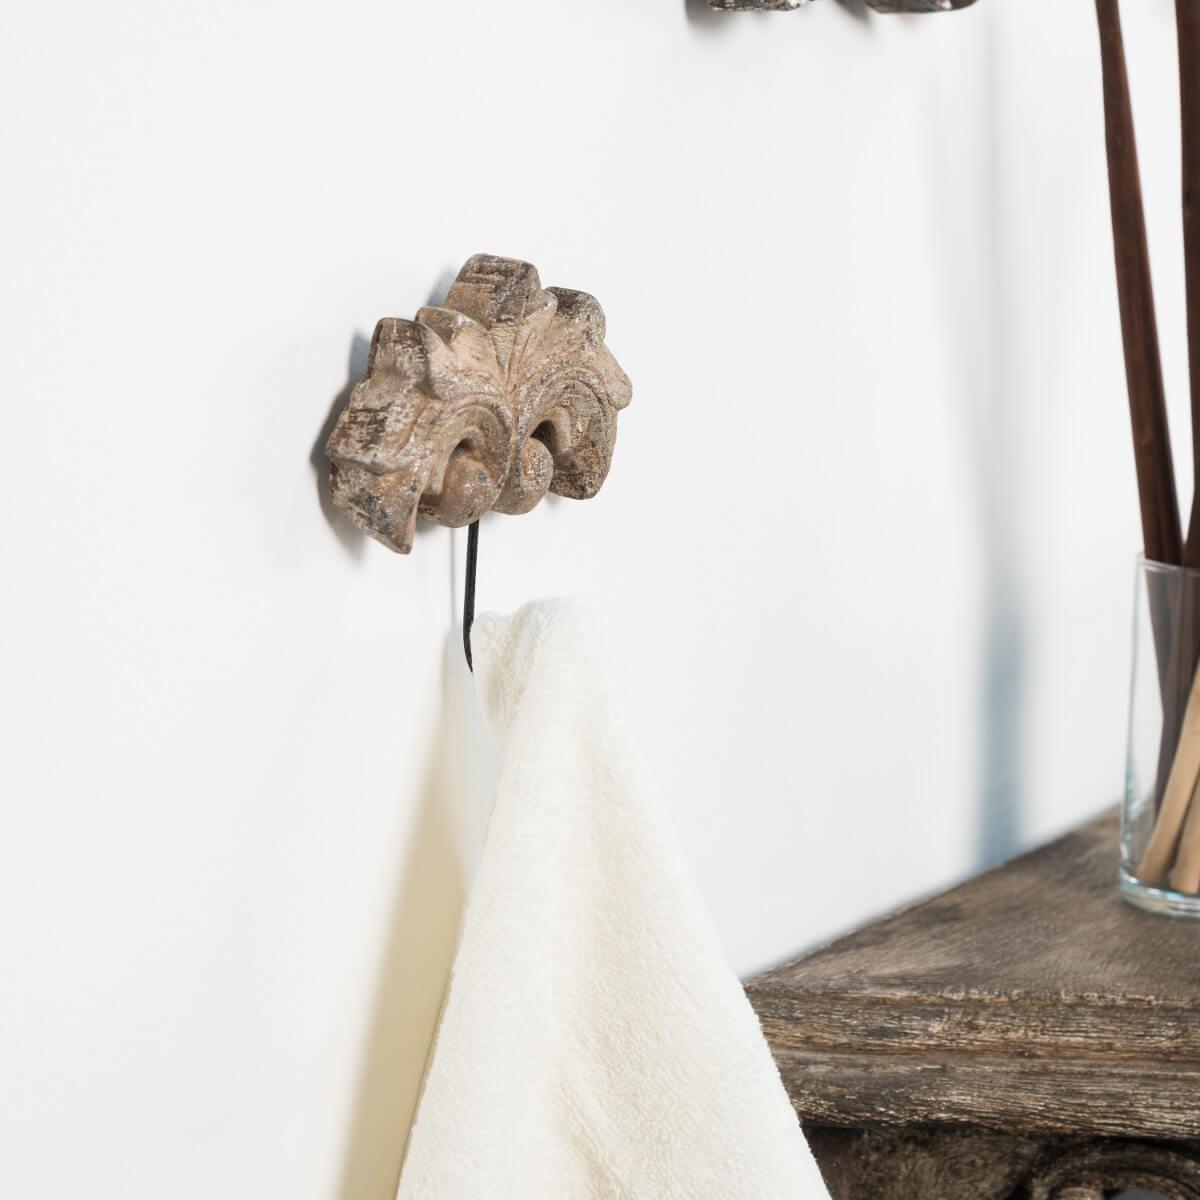 porte serviette mural crochet baroque bronze. Black Bedroom Furniture Sets. Home Design Ideas